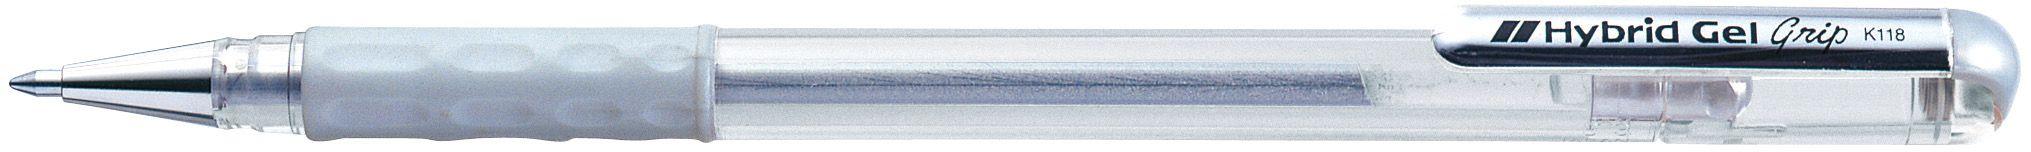 Caneta Hybrid Gel Grip Metallic Prata K118-Z